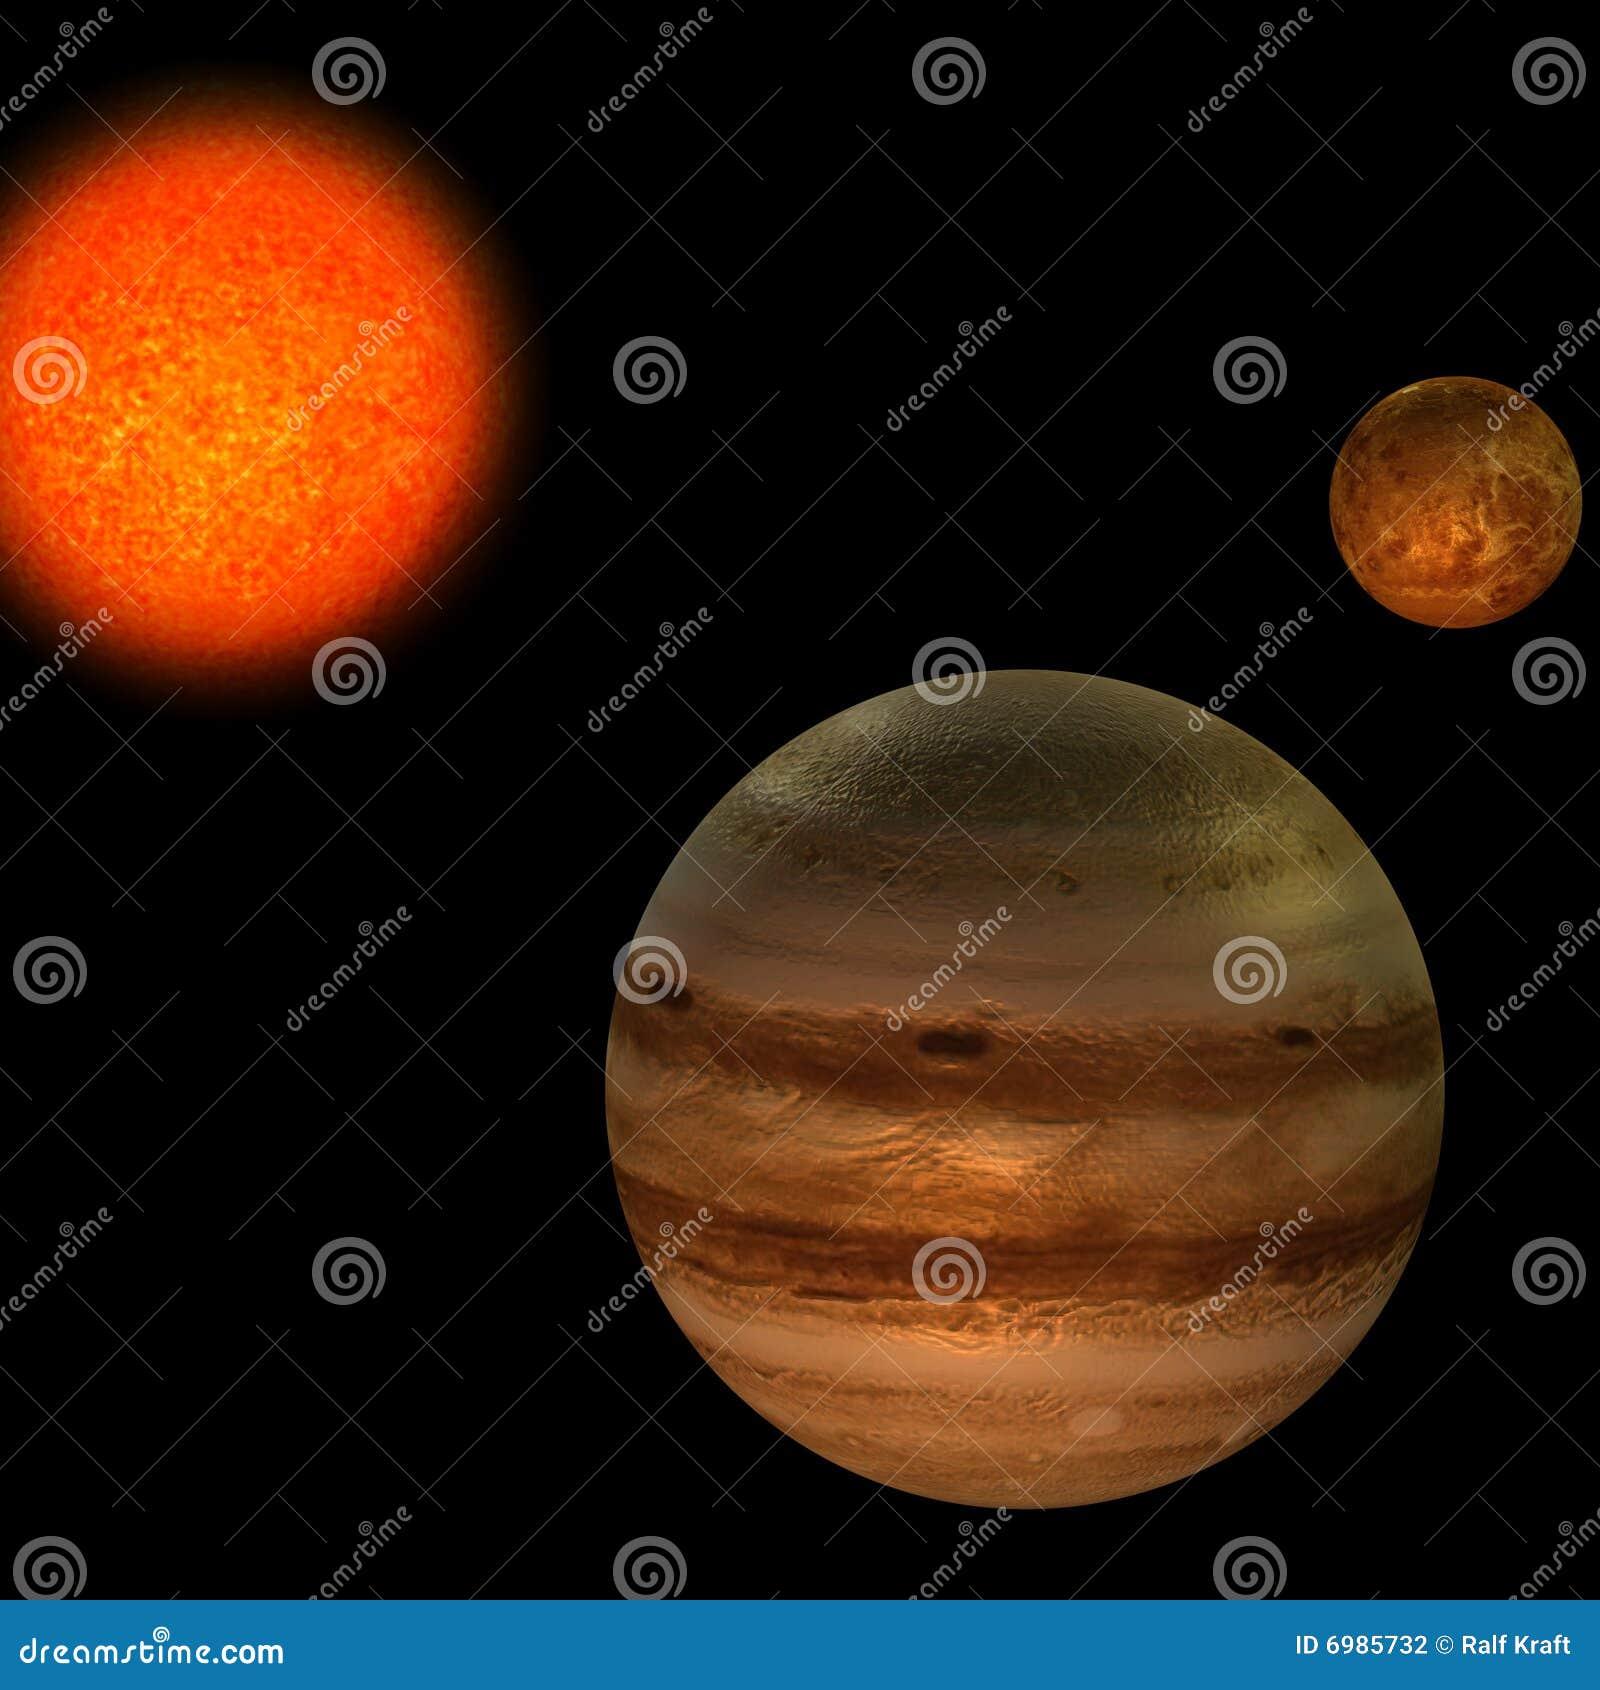 solar system paths - photo #49